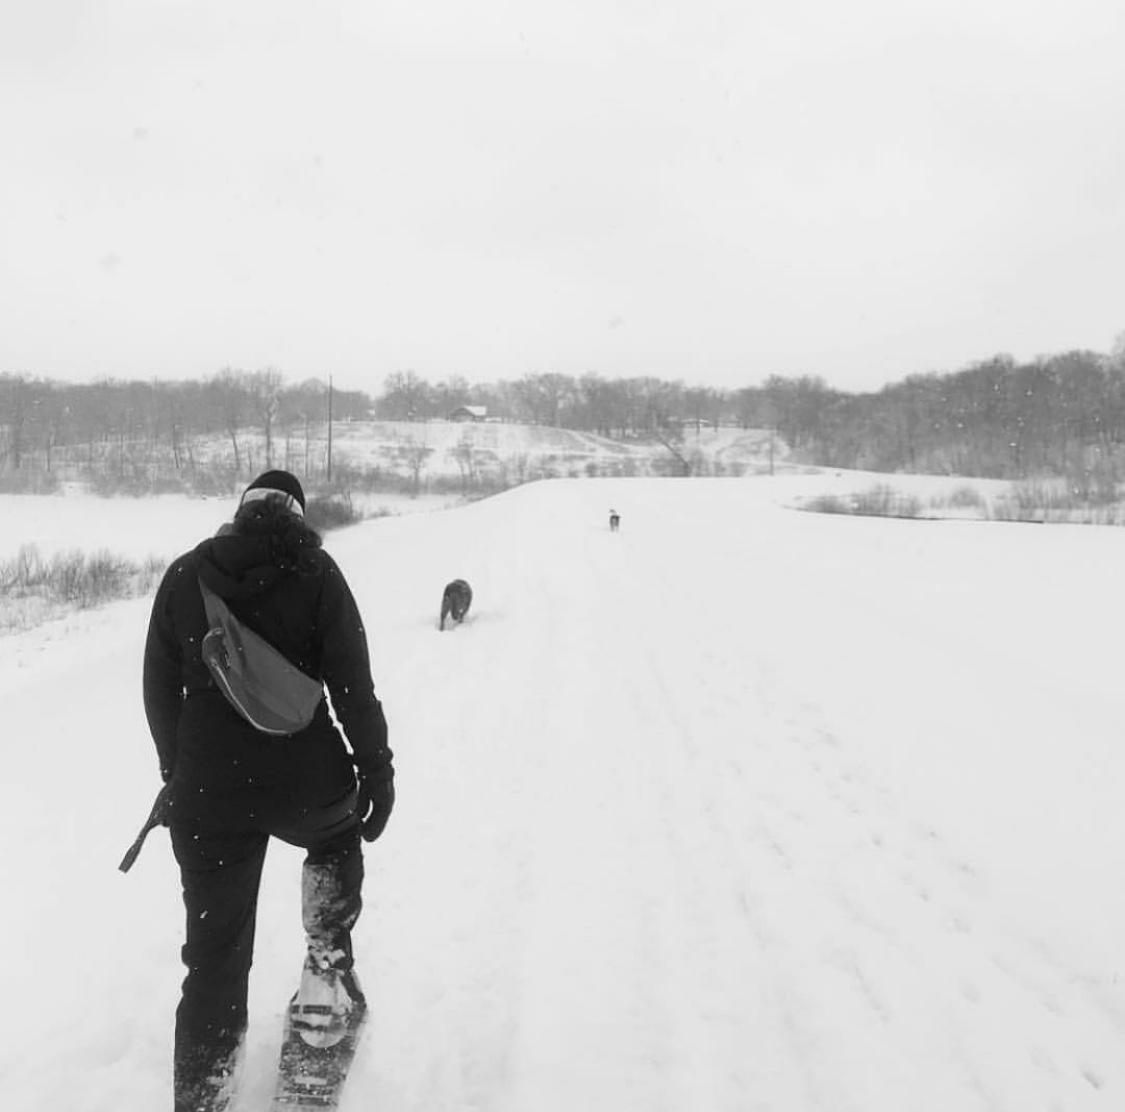 Cross country ski + snow shoe rentals